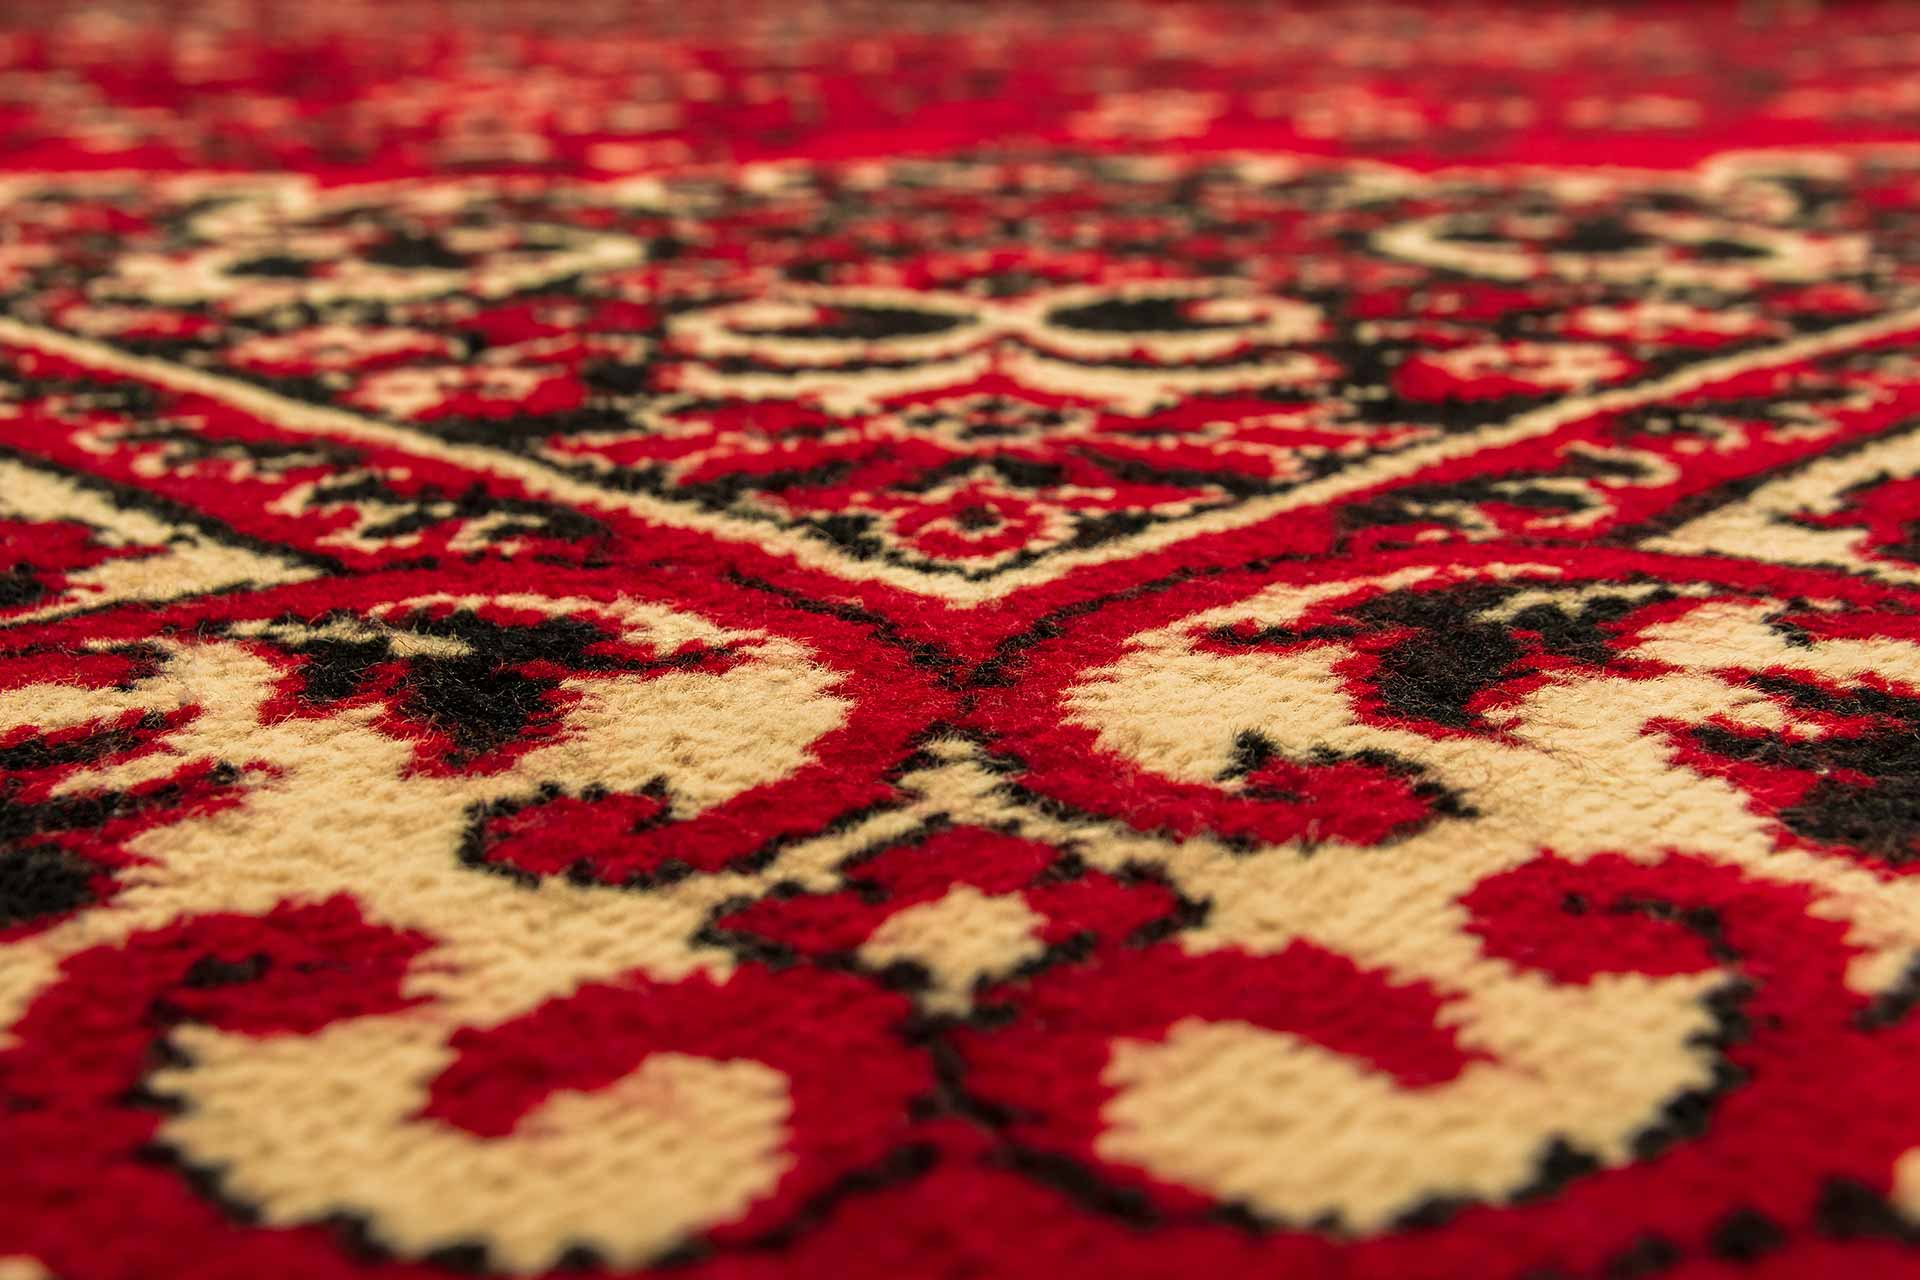 Perzisch Tapijt Kopen : Perzisch tapijt kopen persian gallery